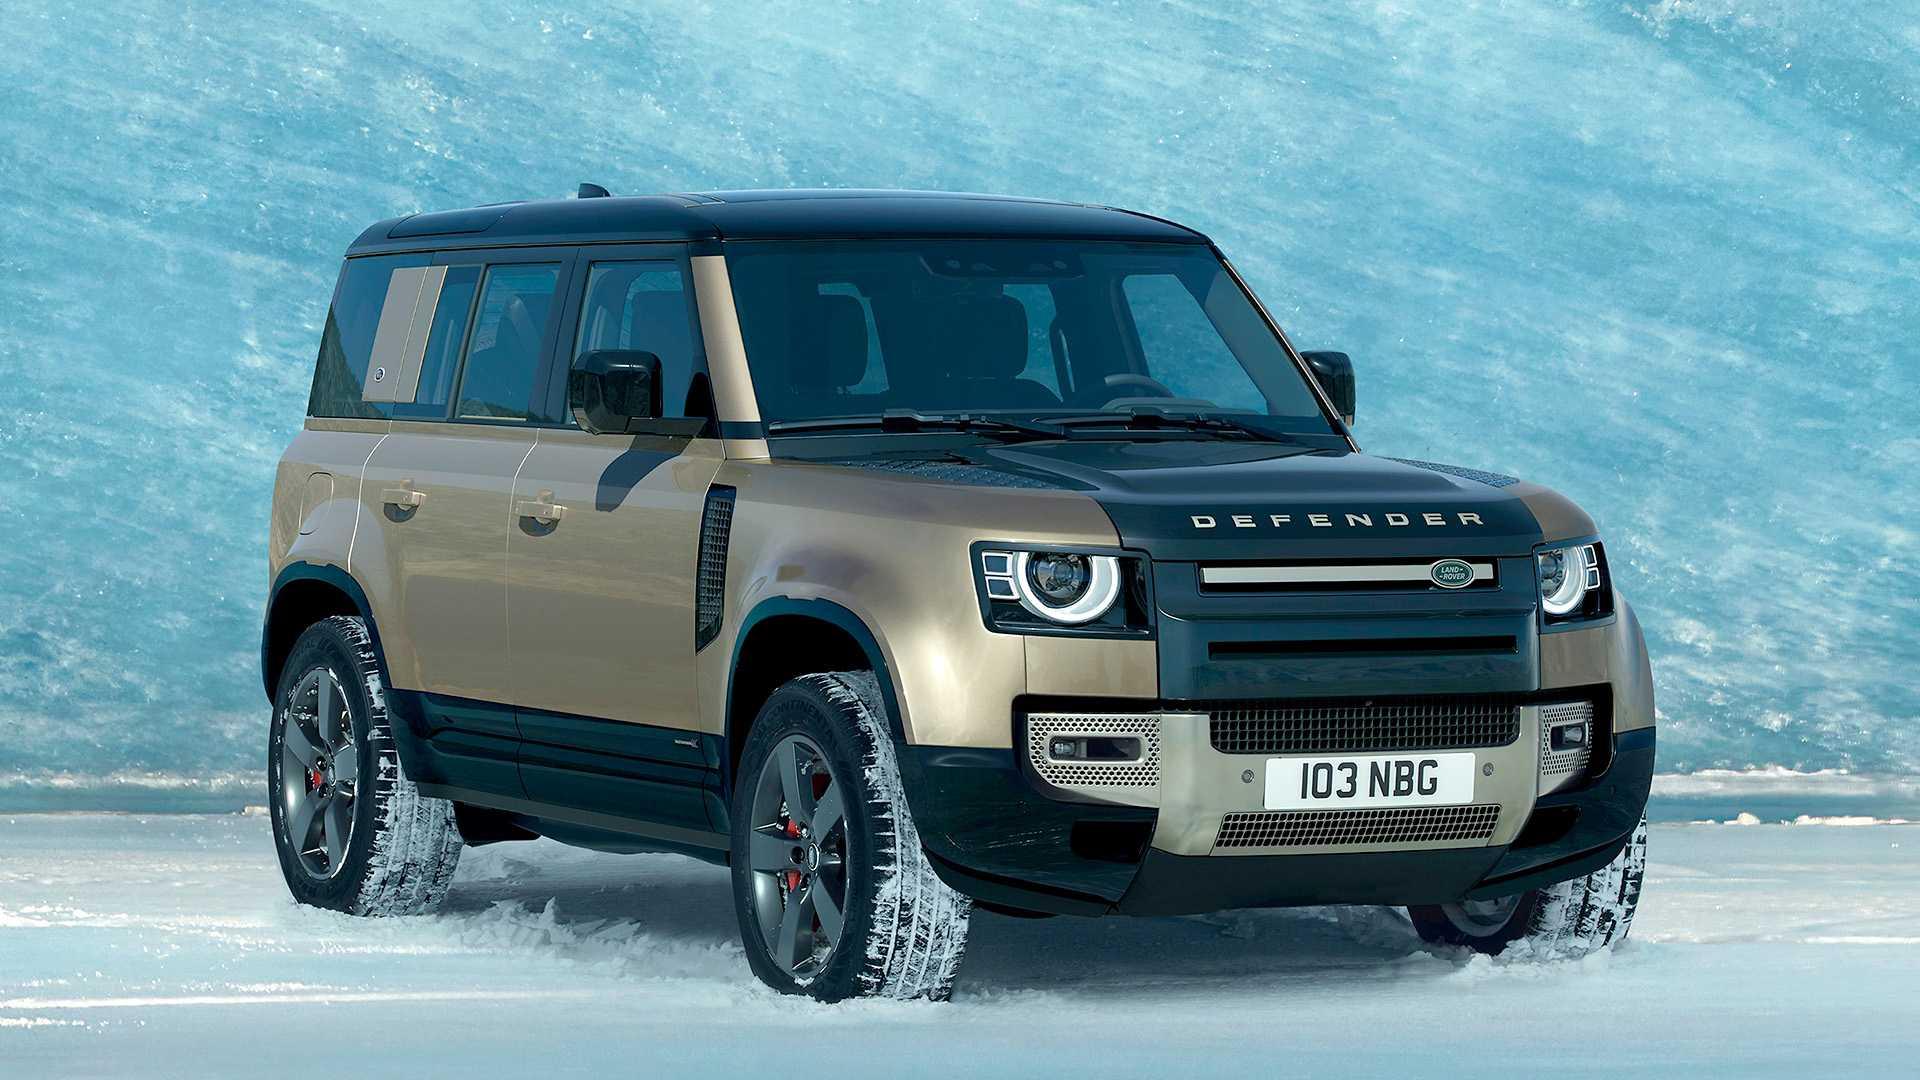 2020 Land Rover Defender Toronto